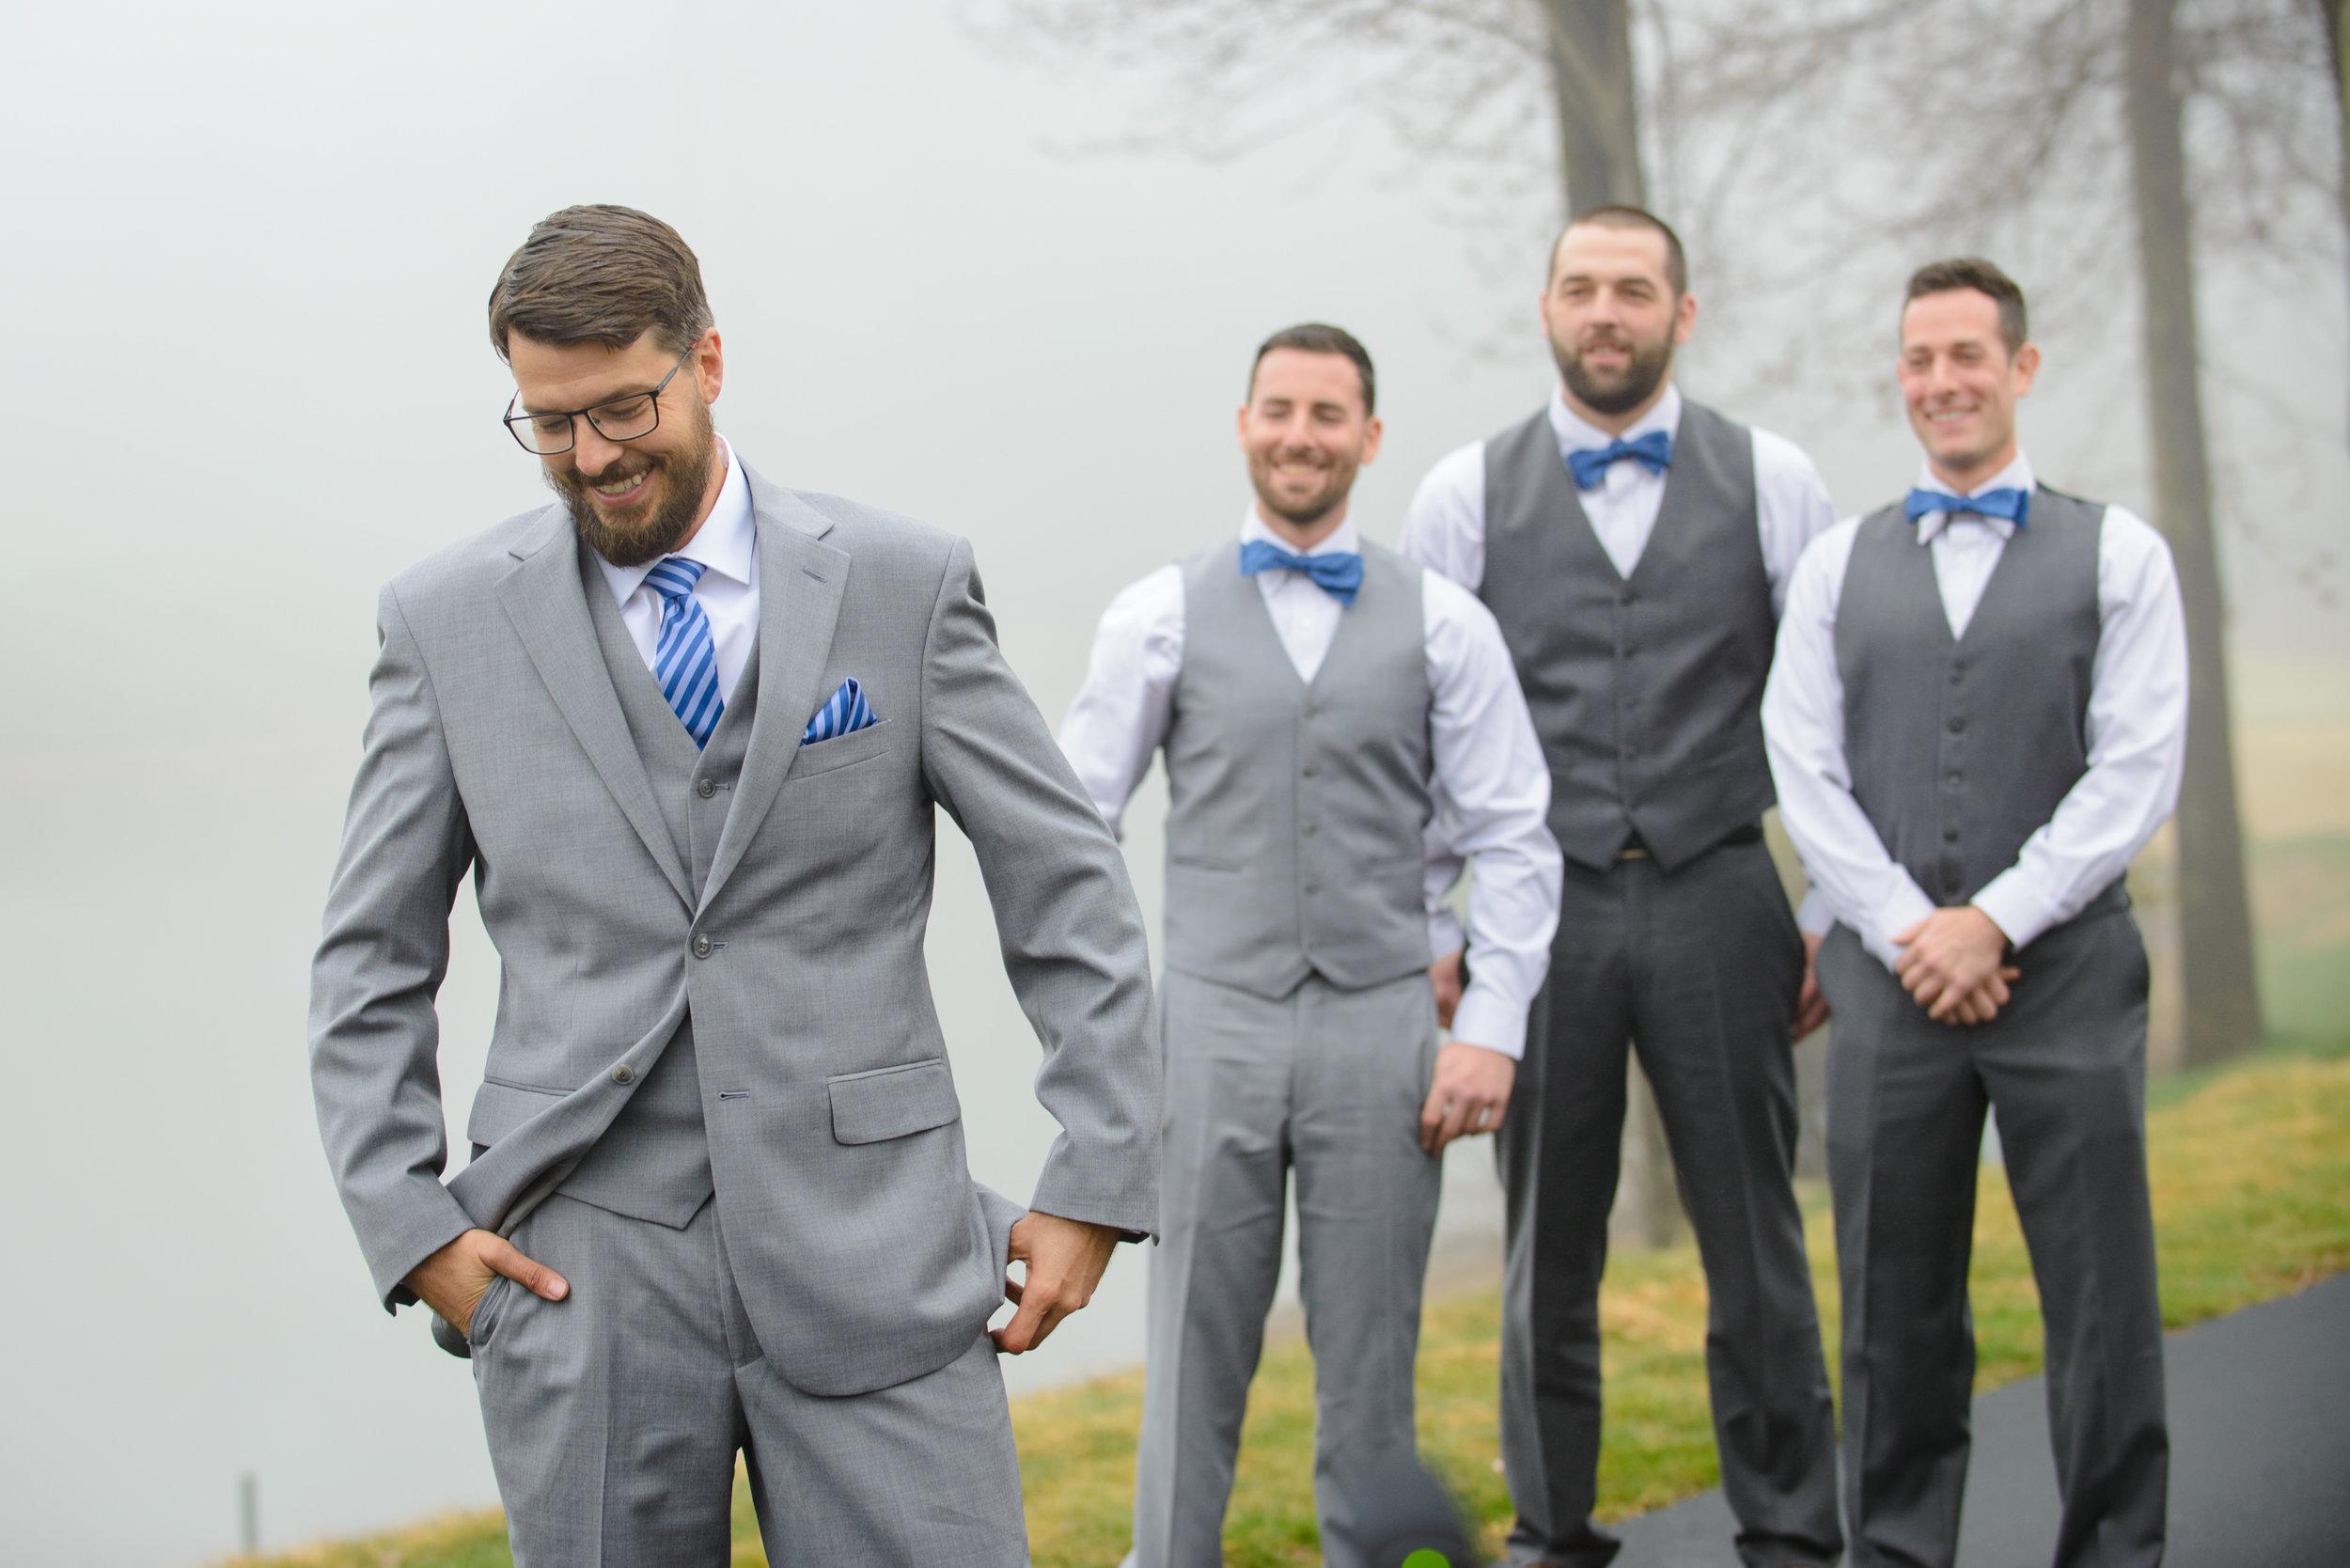 sefick-cliffs-glassy-chapel-wedding-7.jpg